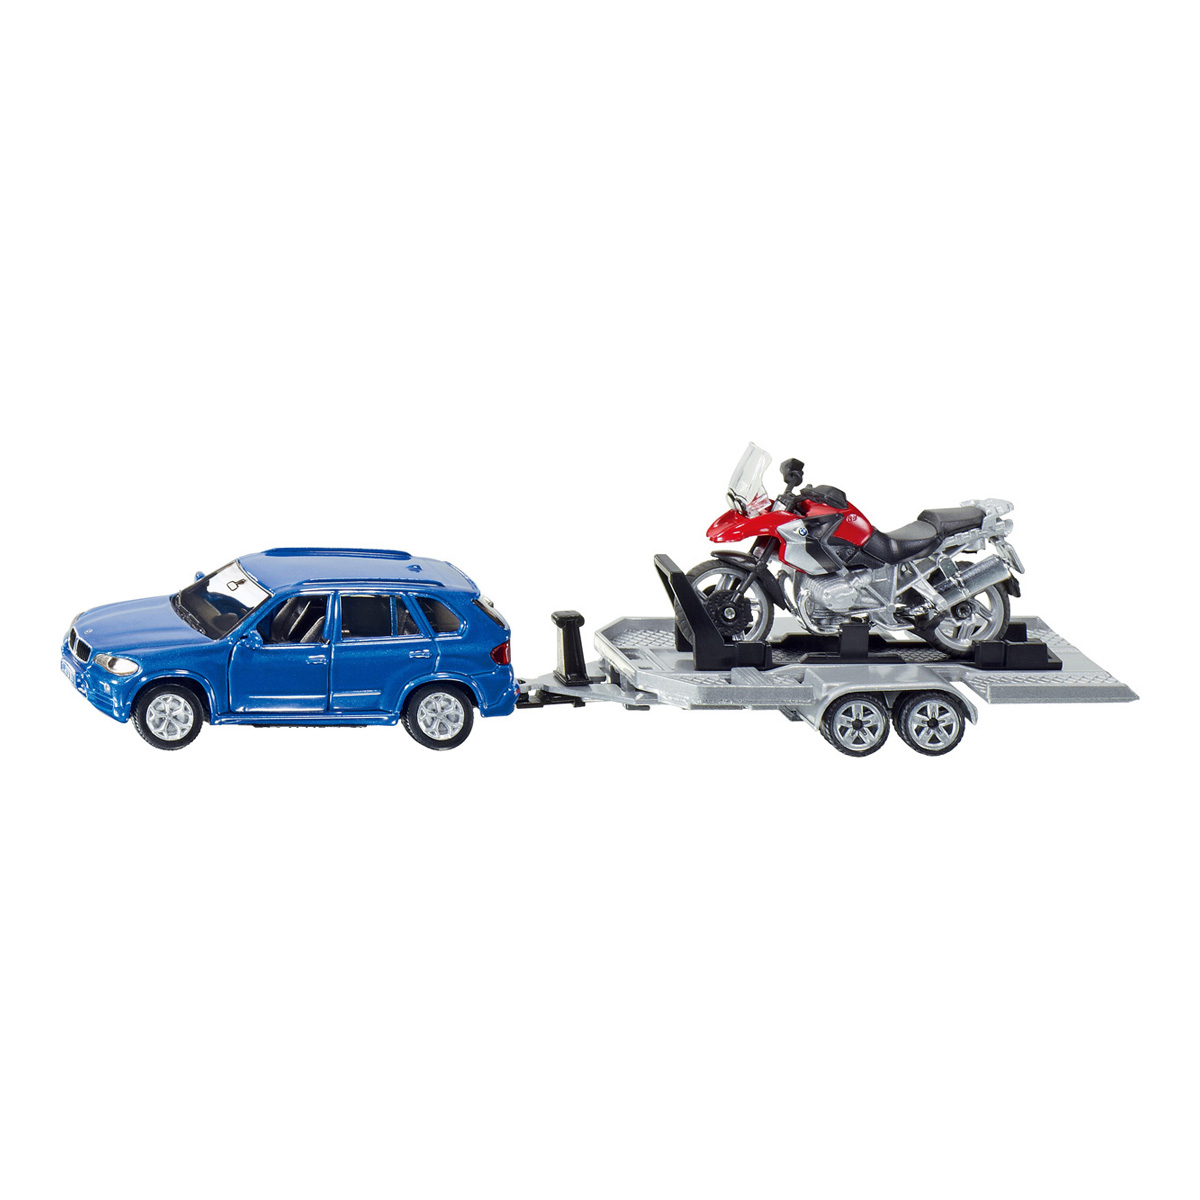 BMW×5 バイク用トレーラー付(ジク・SIKU)